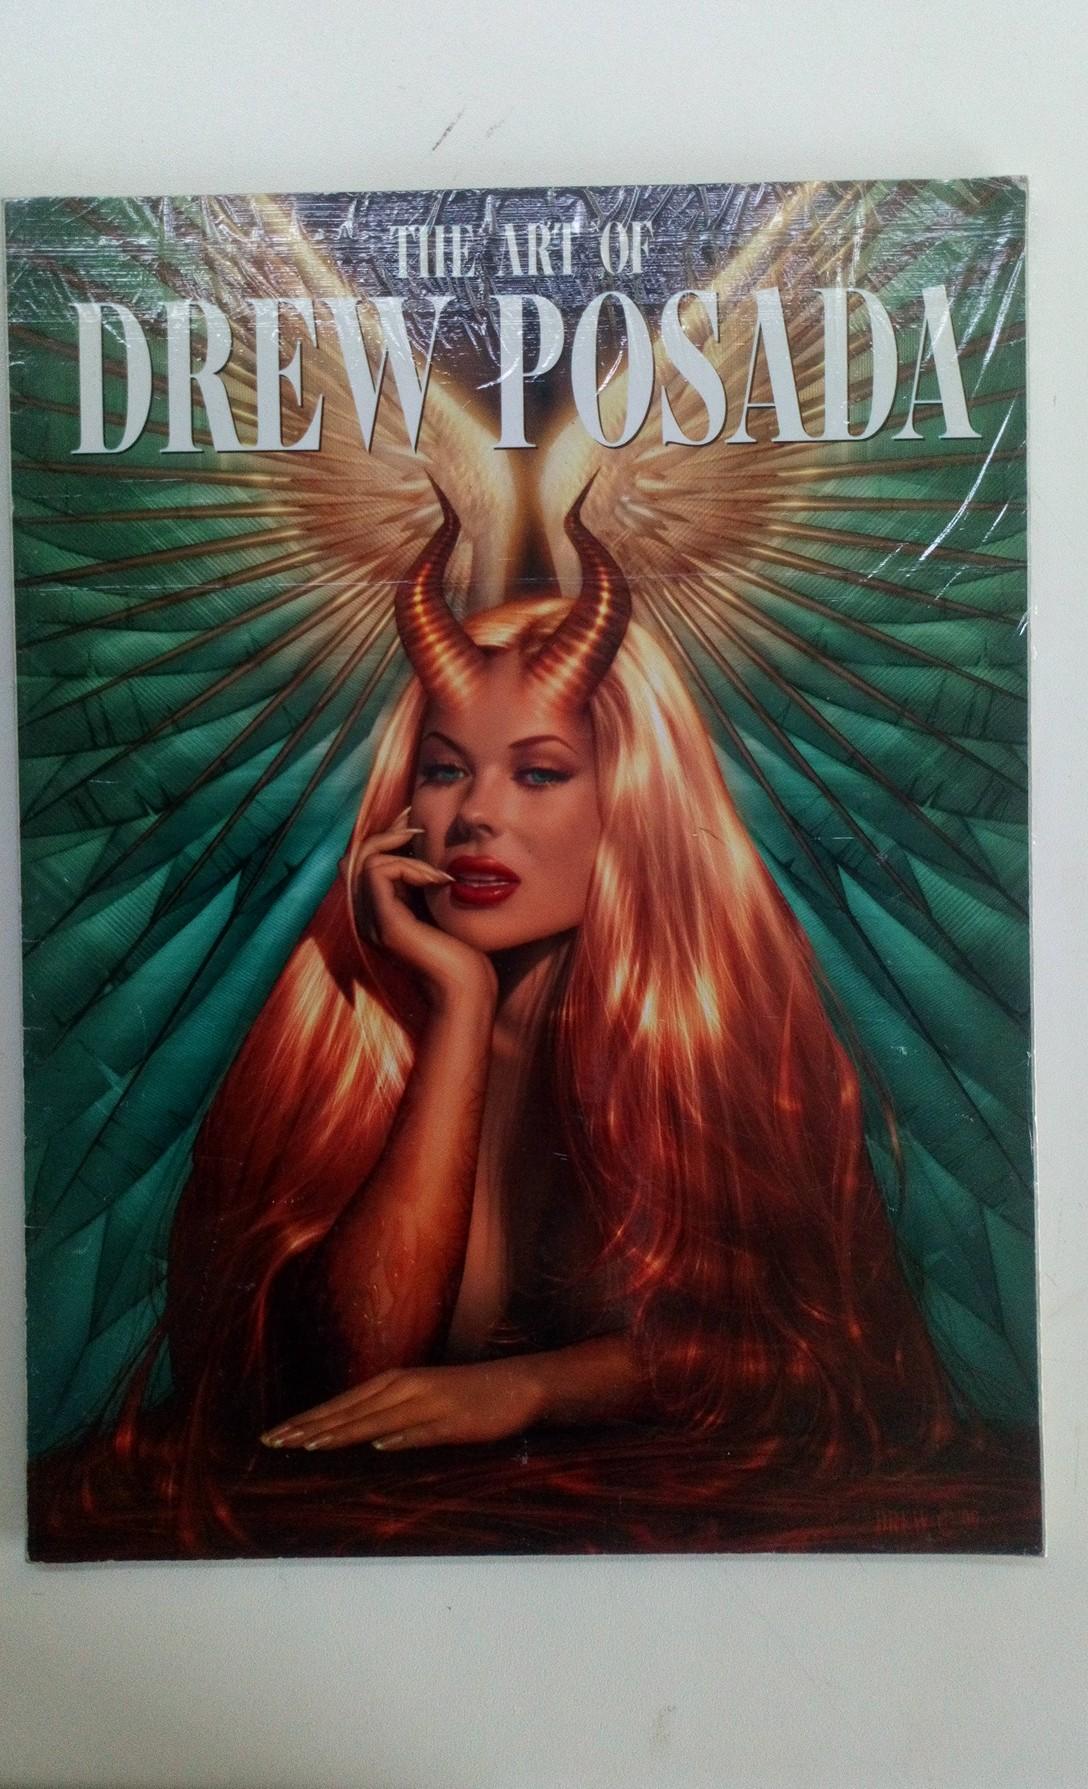 The art of Drew Posada